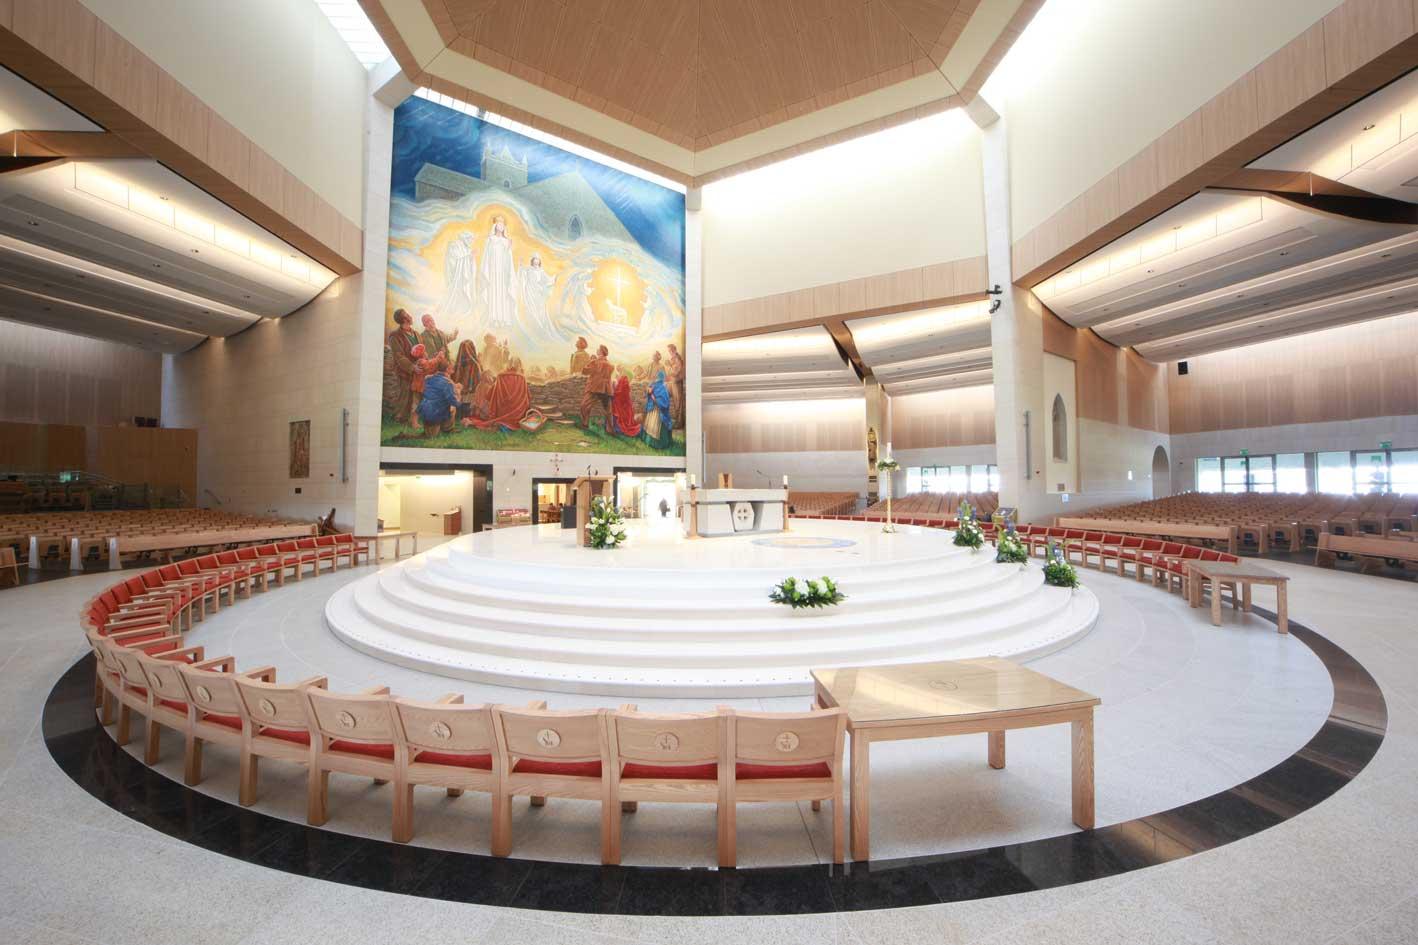 Knock Basilica Sanctuary chairs furniture red upholstered shrine bespoke (3)